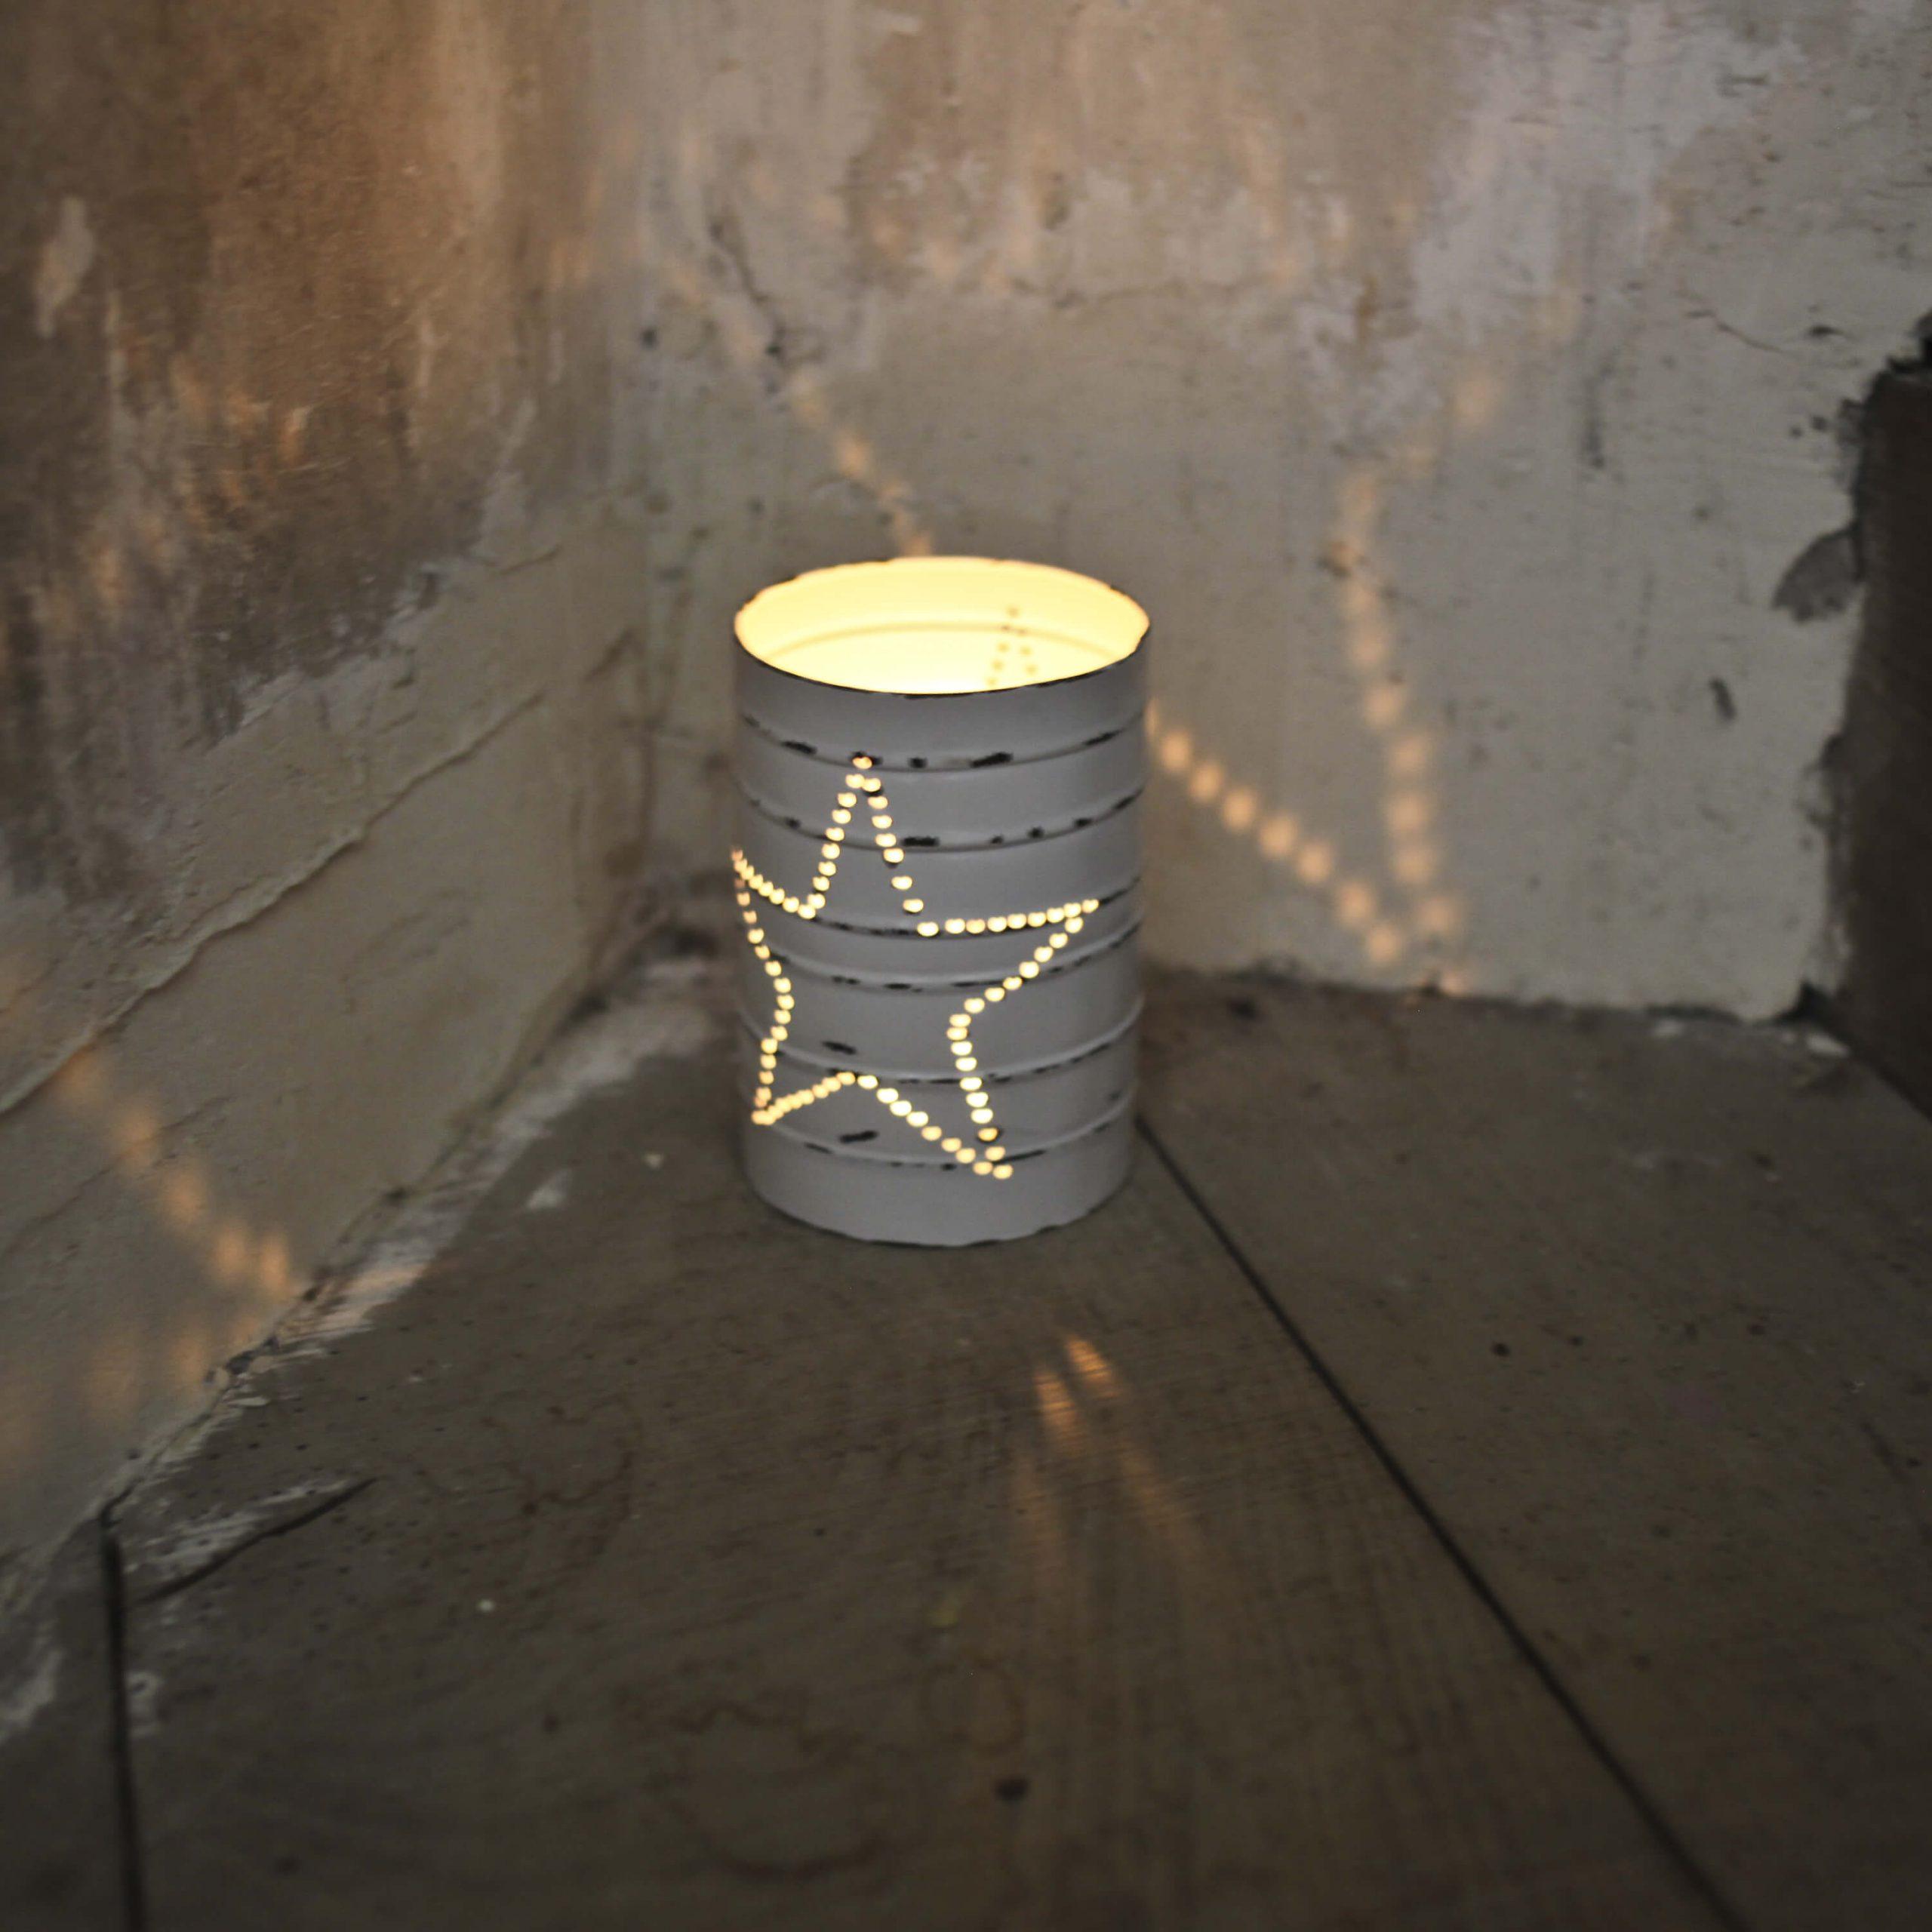 Nkuku lantaren blik met ster